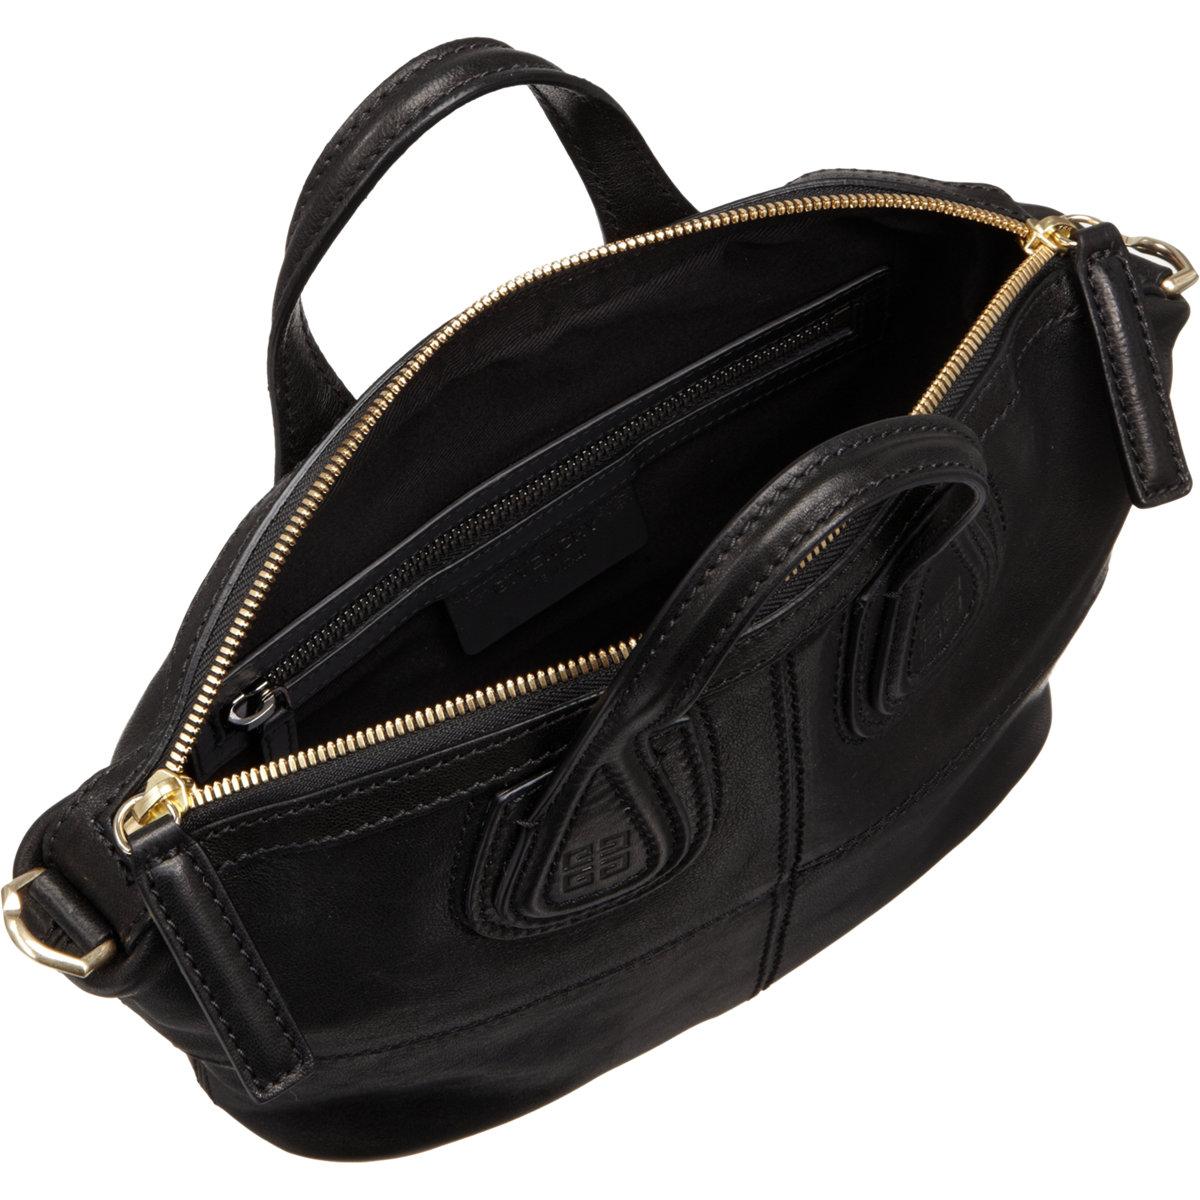 Givenchy micro nightingale satchel at barneys.com